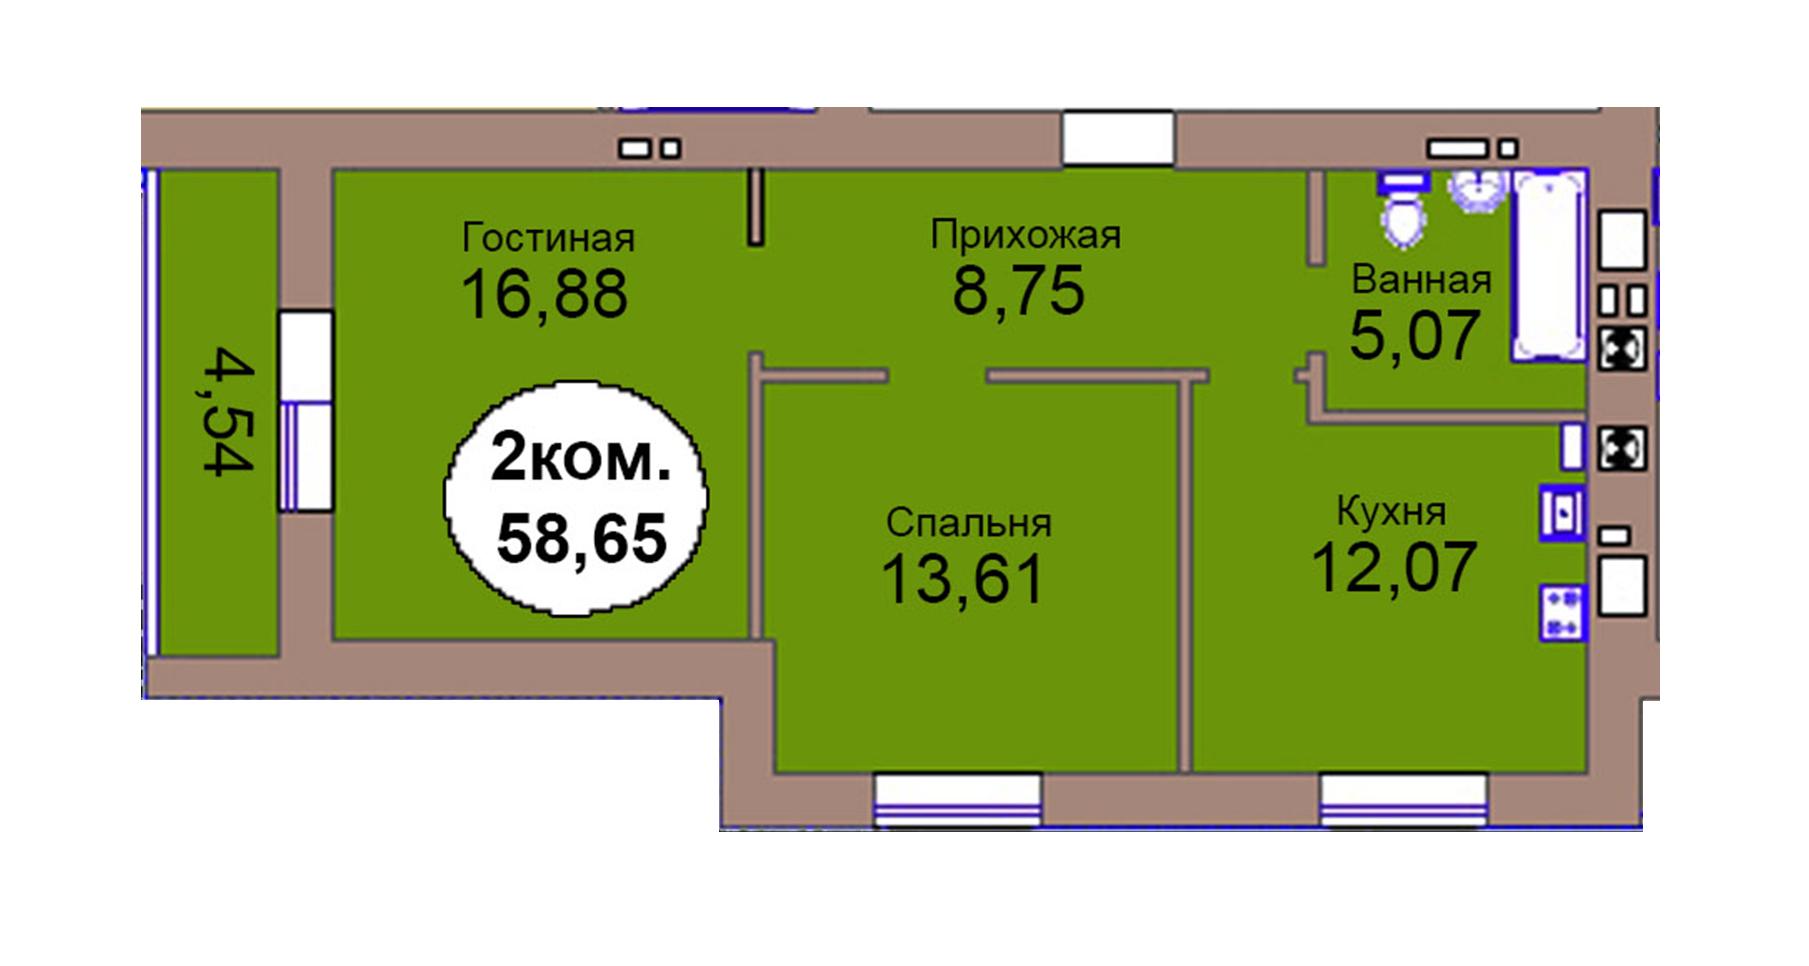 2-комн. кв. по пер. Калининградский, 4  кв. 140 в Калининграде